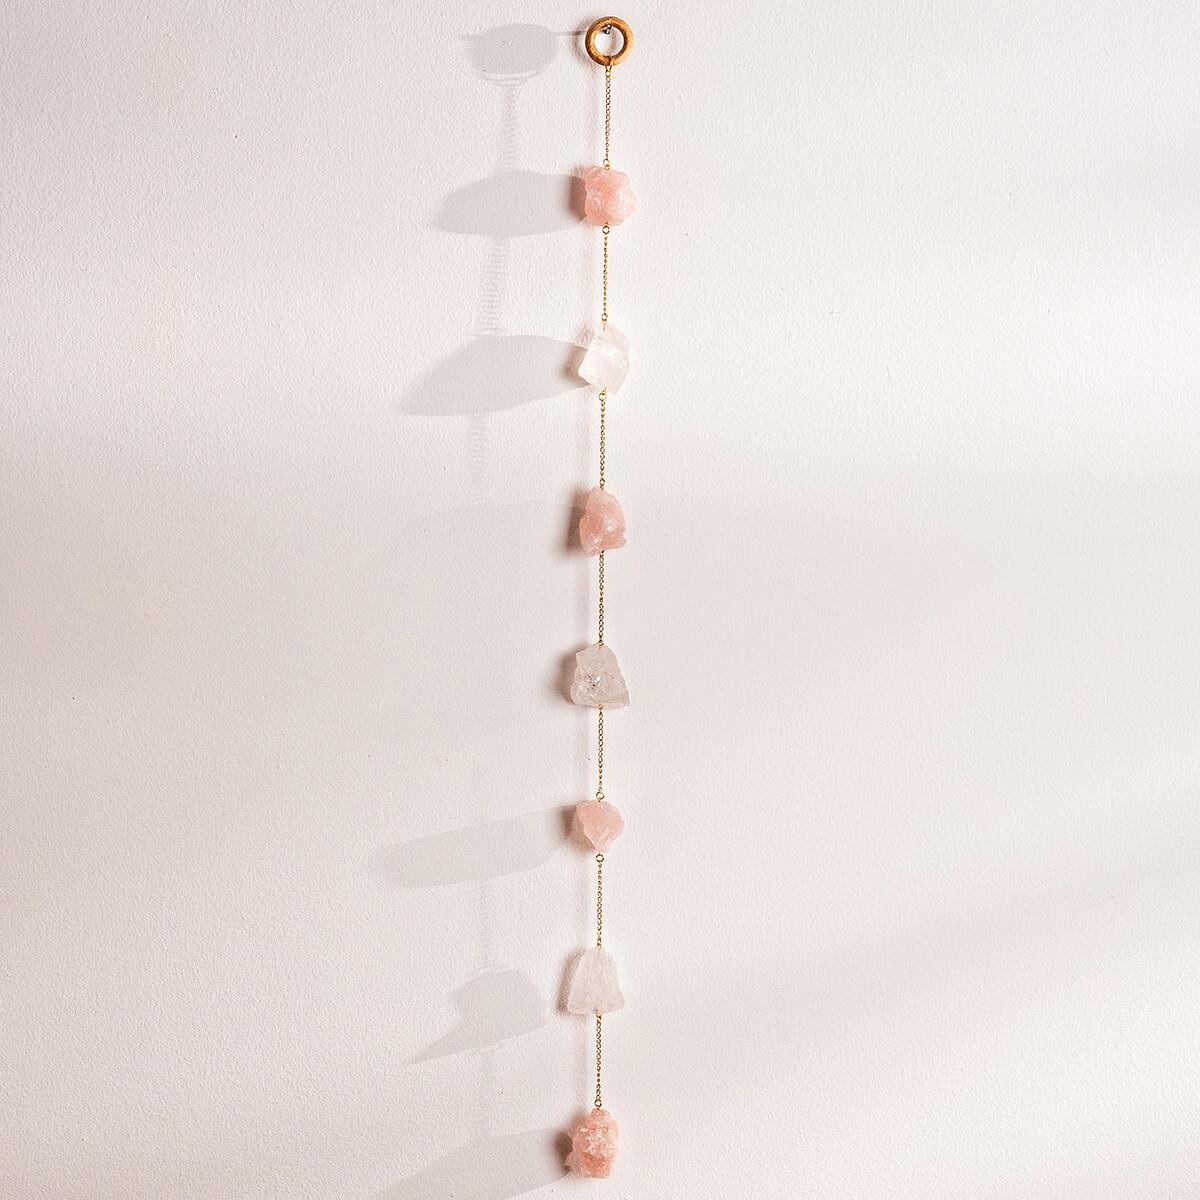 rose quartz wall hanging